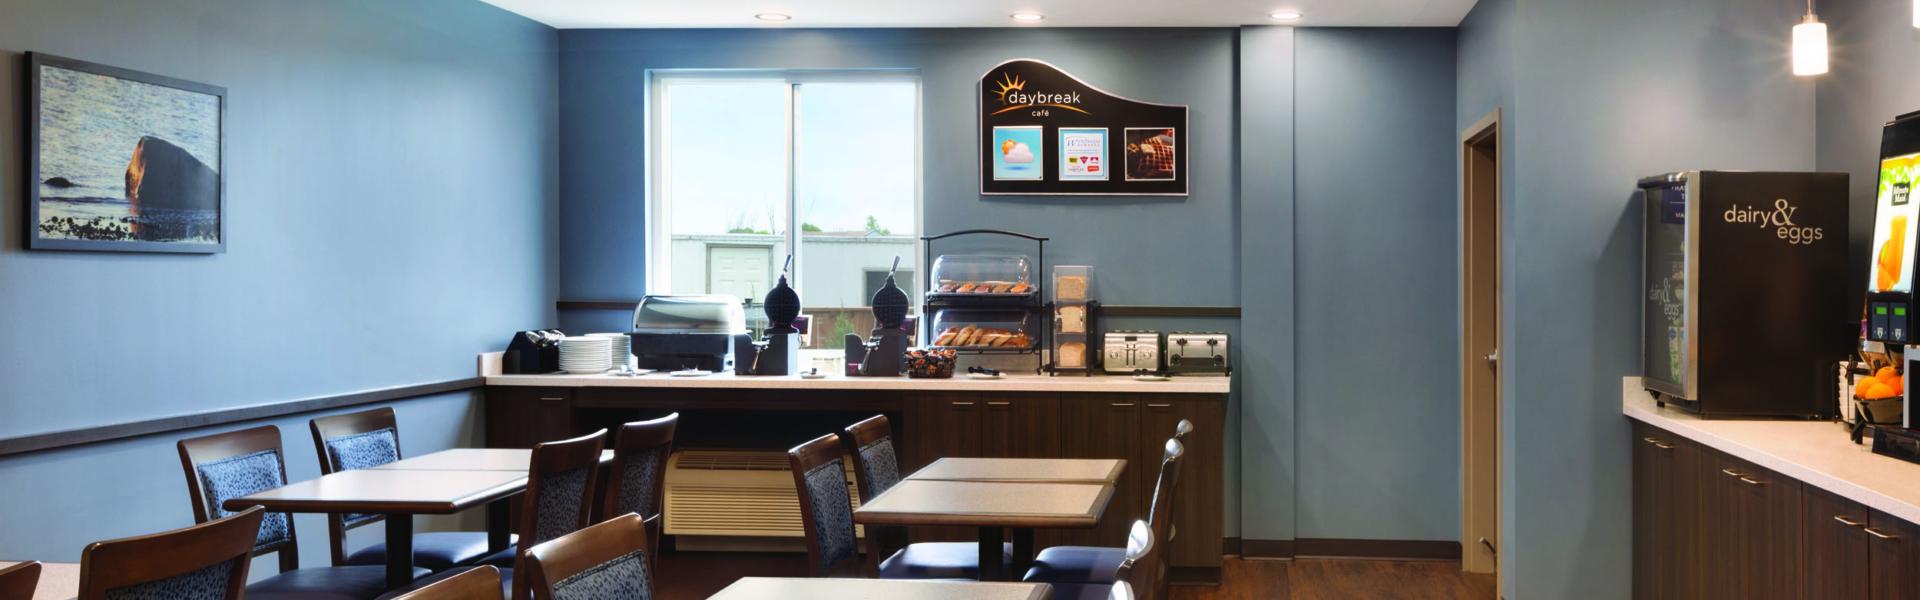 days inn lindsay welcome to the newly built days inn u0026 suites lindsay